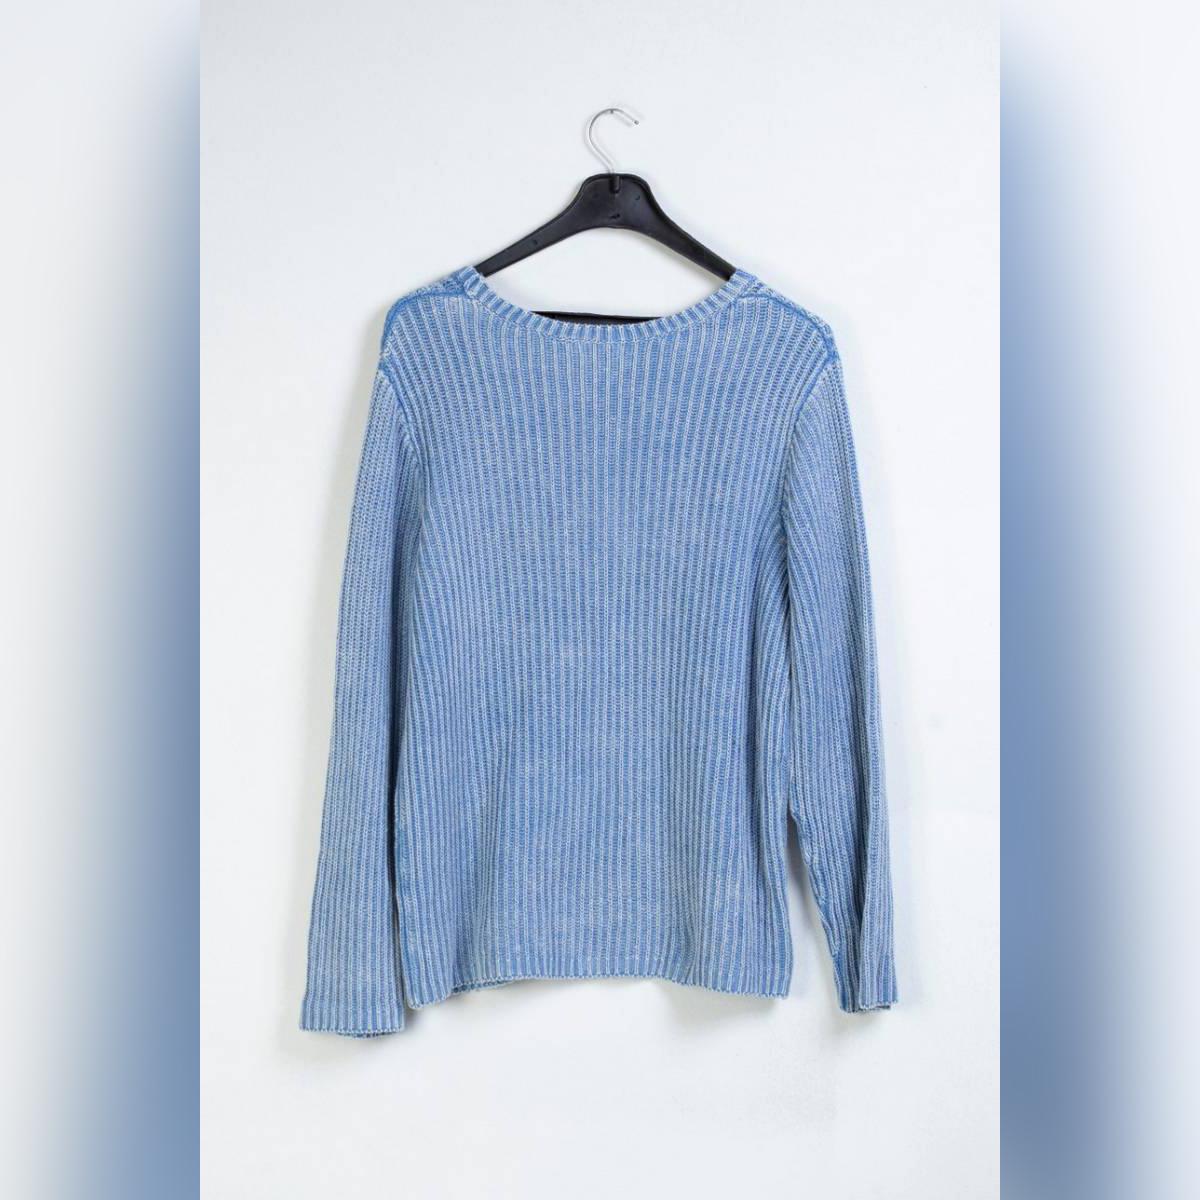 Marled Pullover Sweater Ecosmart Fleece